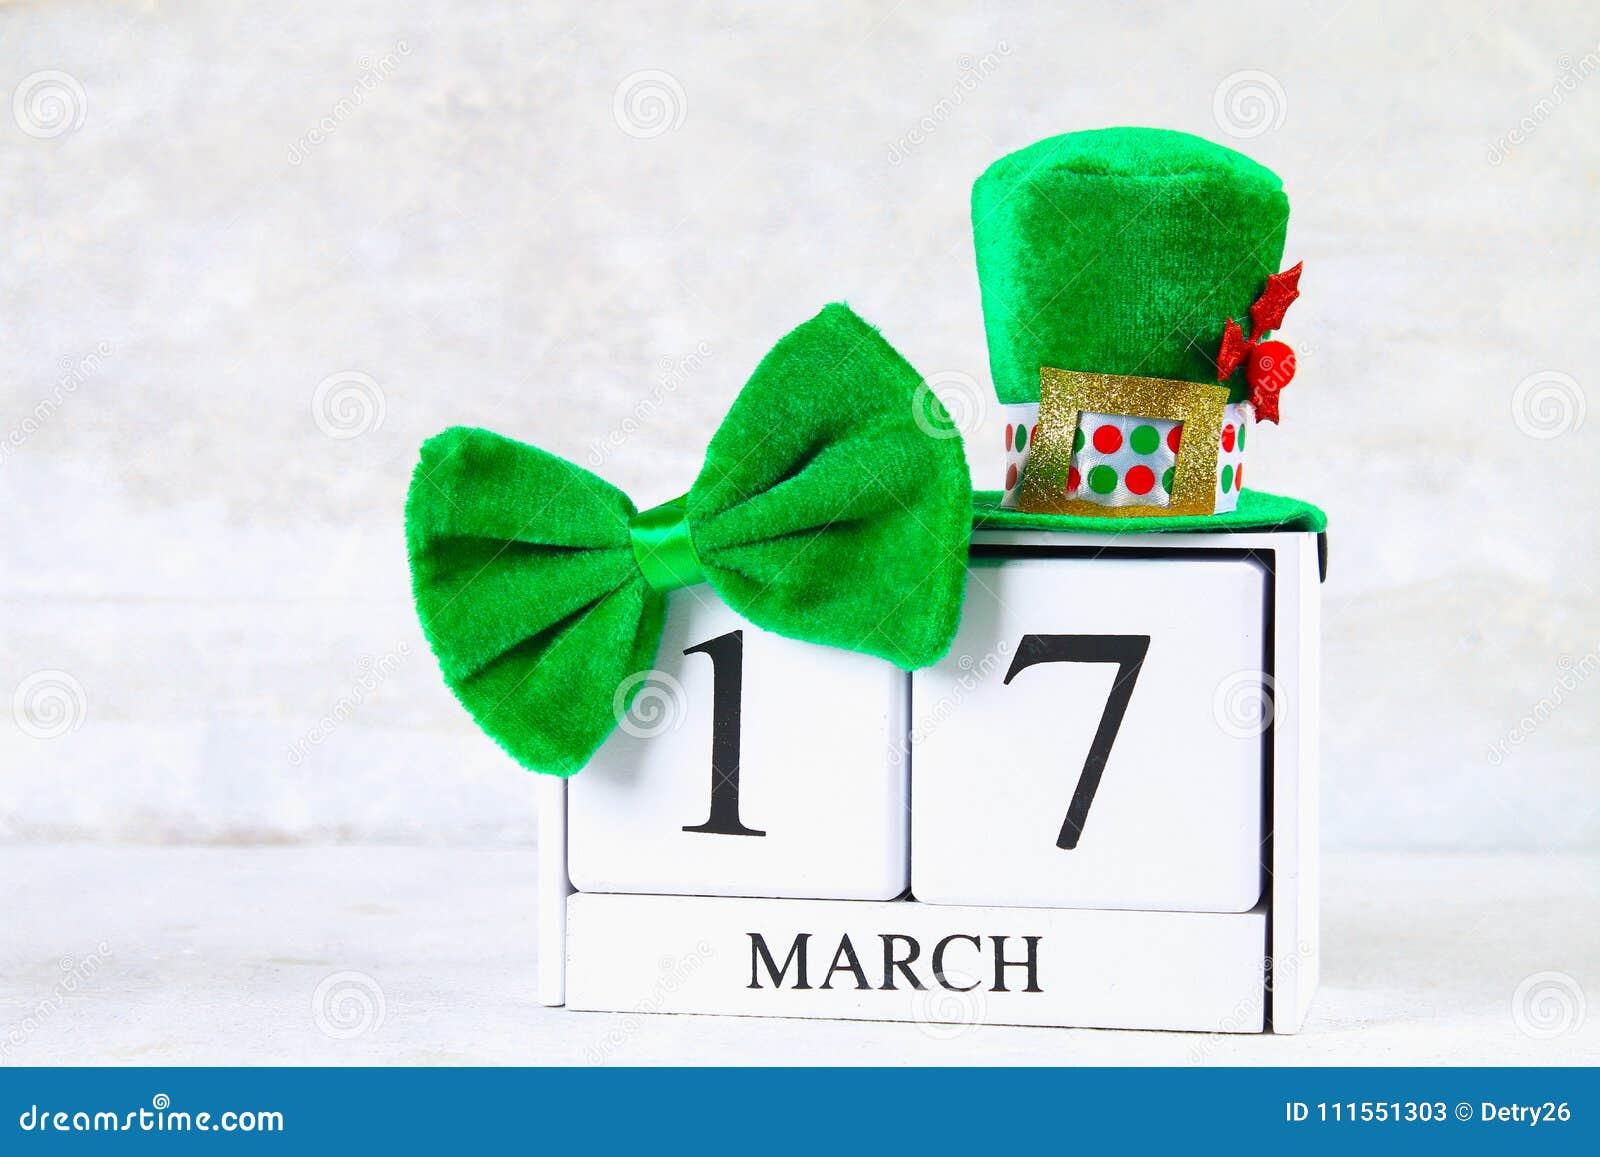 St Patrick\u2019s Day Bow